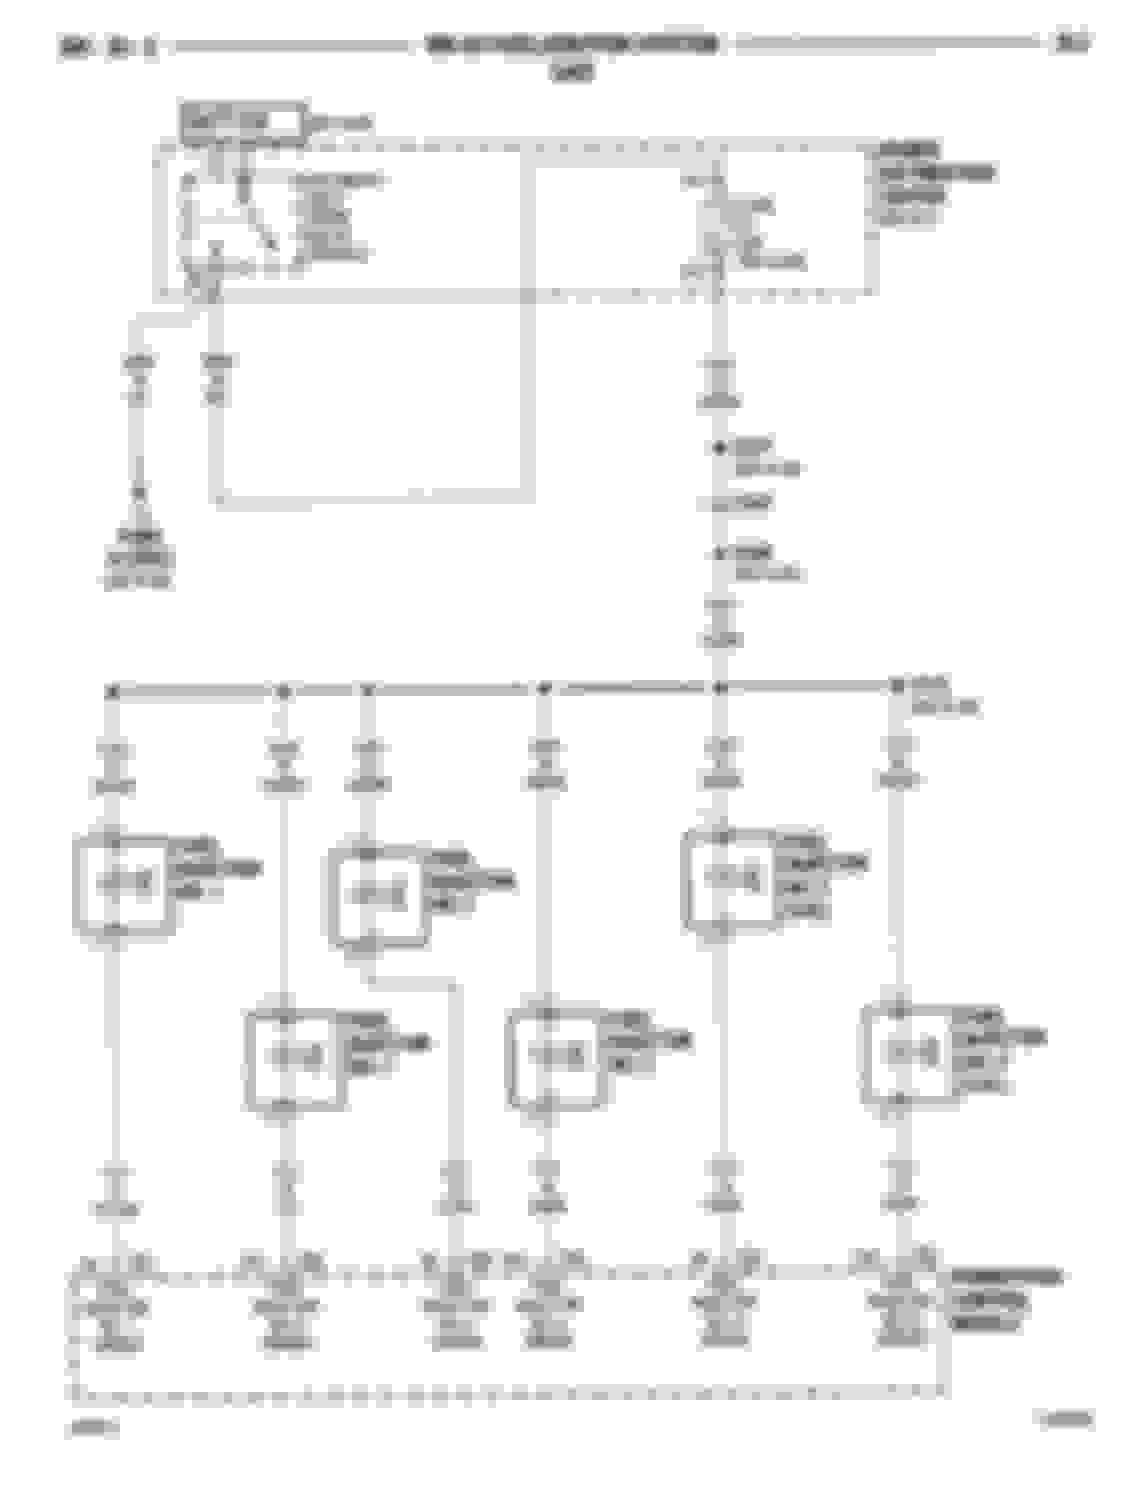 2000 jeep grand cherokee injector wiring harness wiring diagram val 2000 jeep grand cherokee fuel injector wiring harness wiring 2000 jeep grand cherokee injector wiring harness